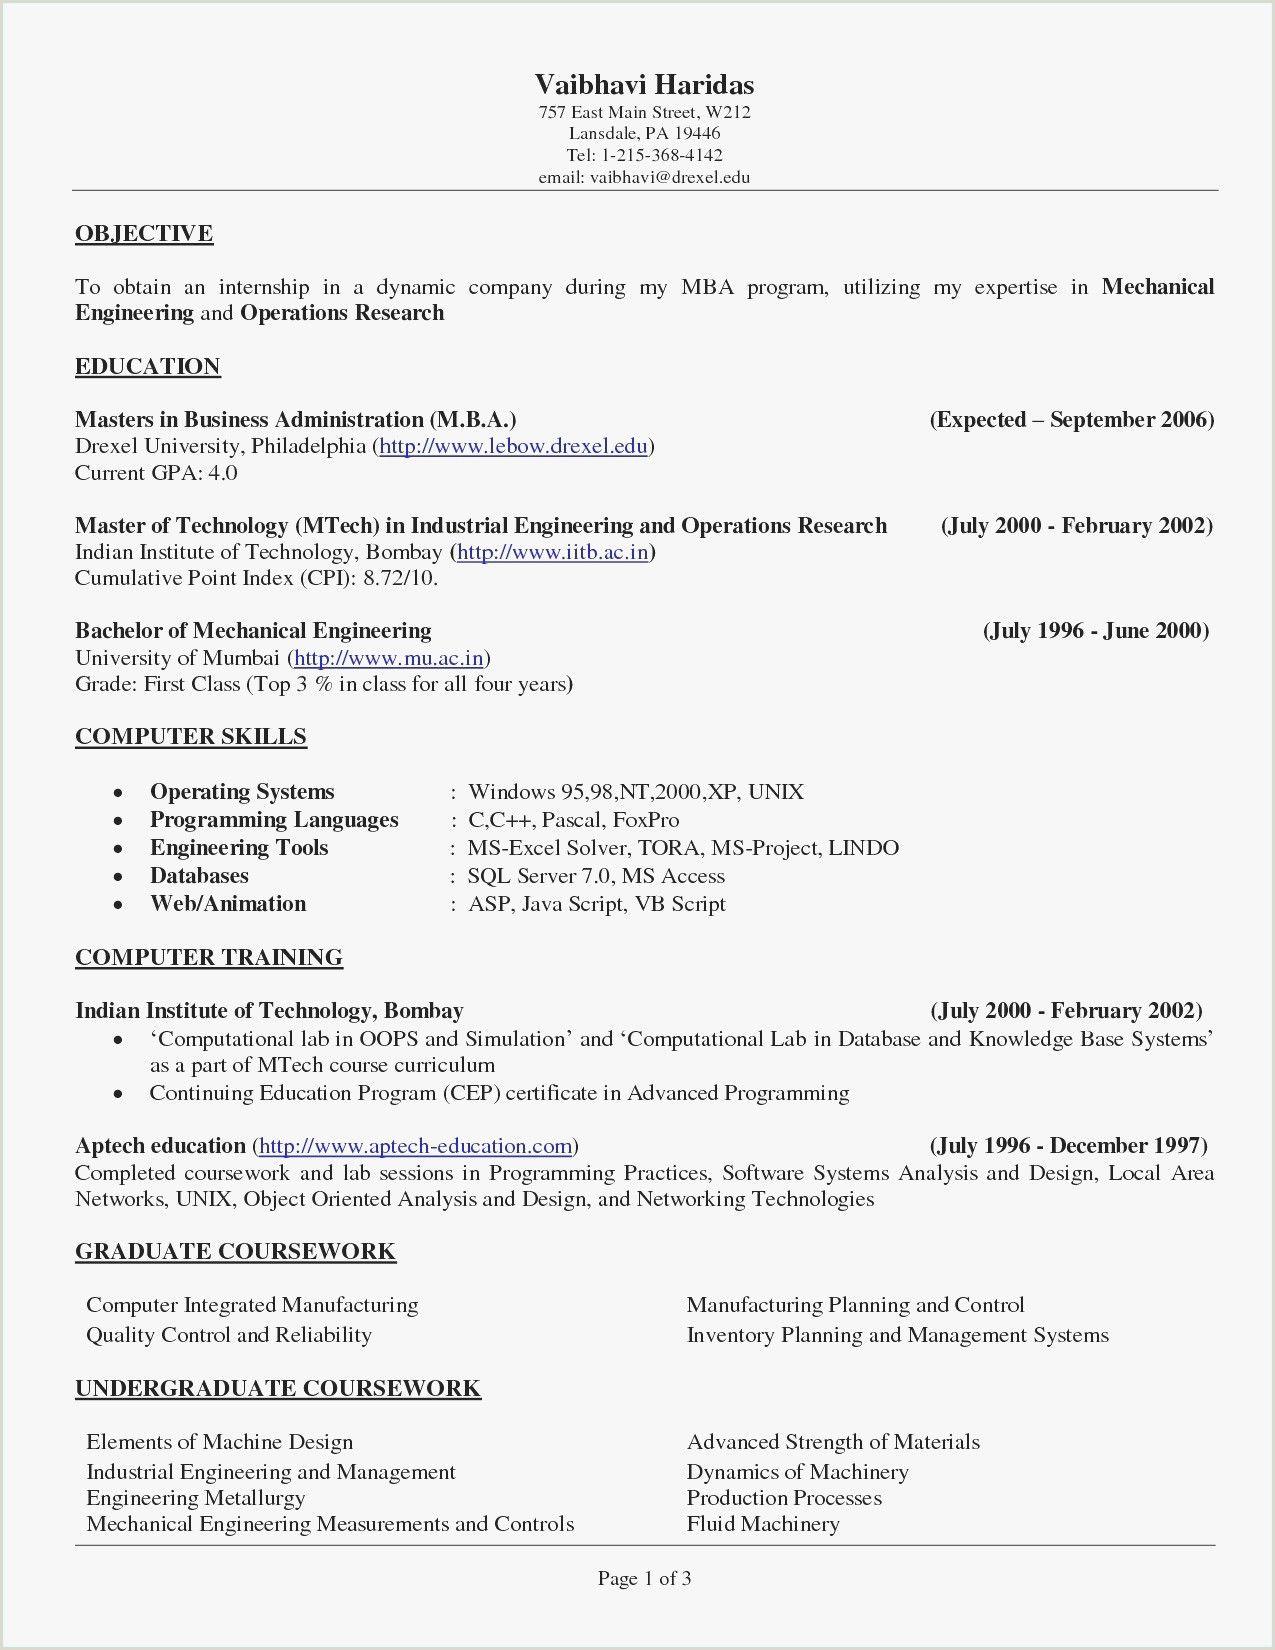 Cosmetology Student Resume Resume objective statement